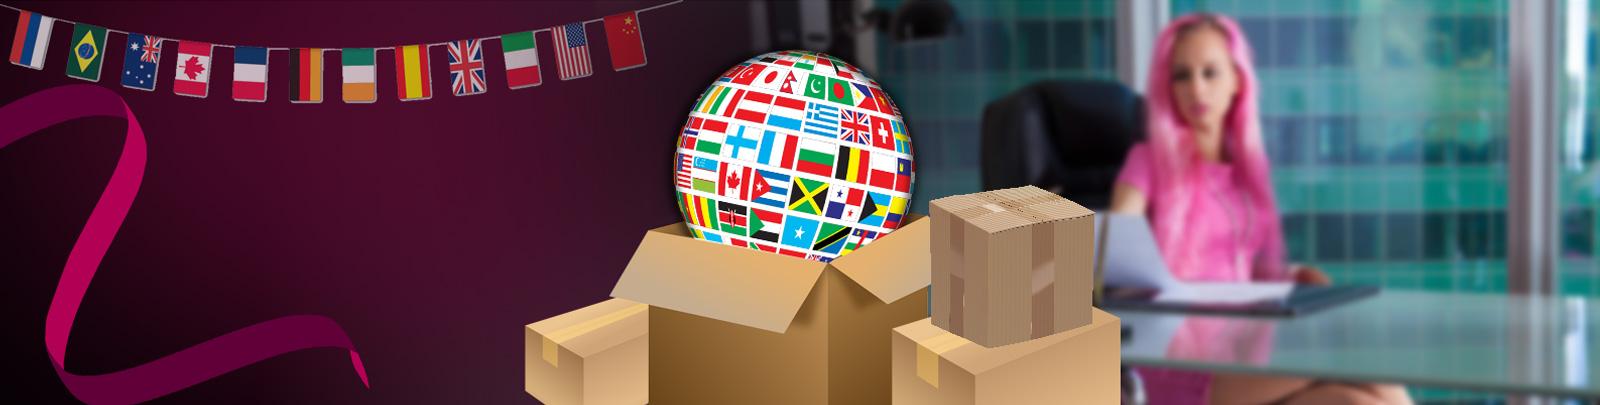 Returns and Exchange Information